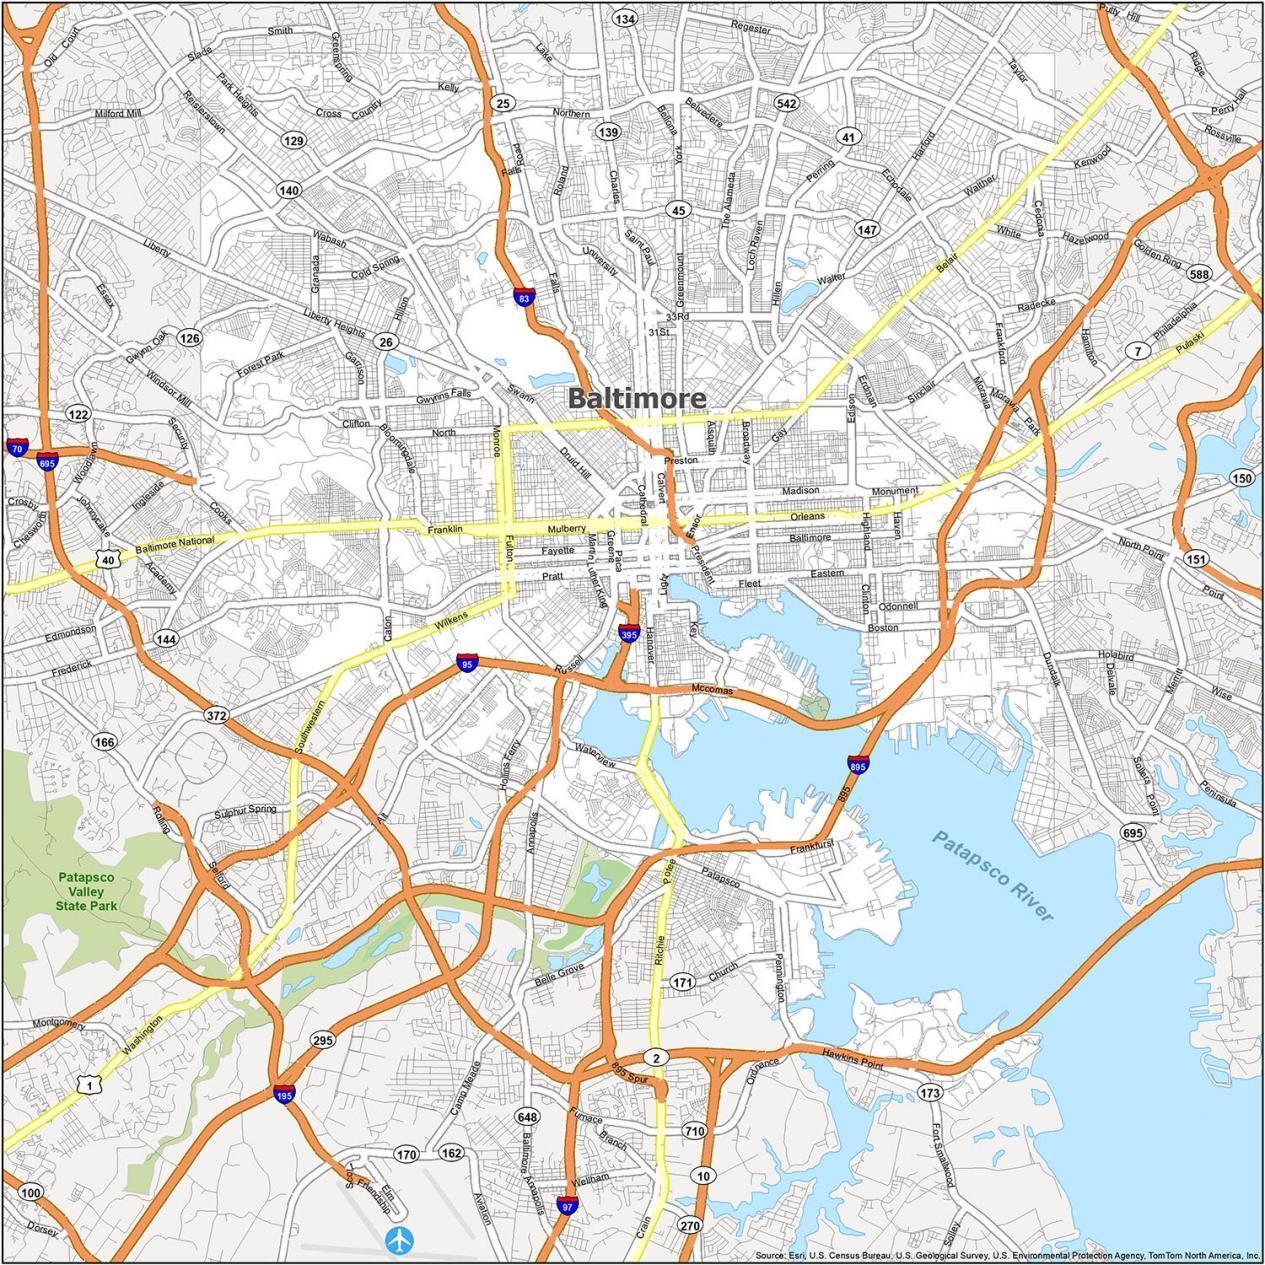 Baltimore Road Map